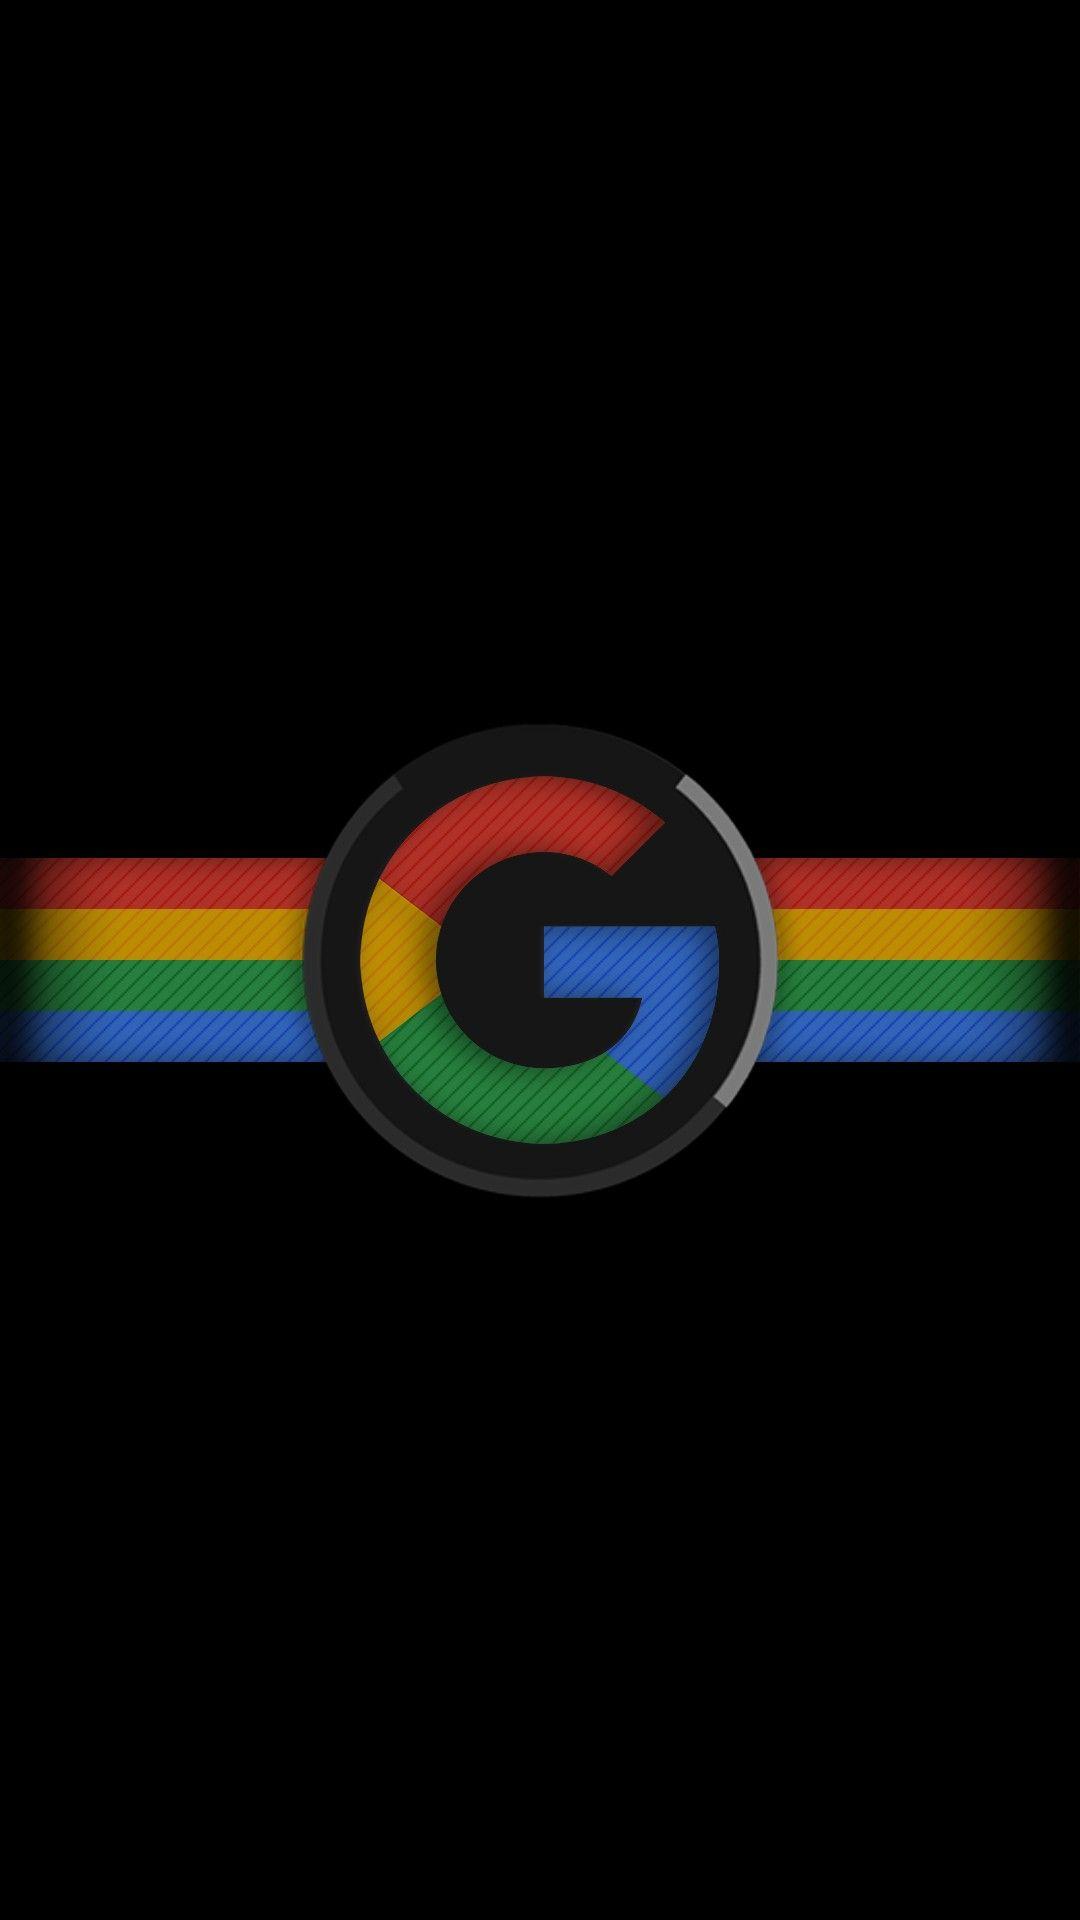 Wallpaper Google Google Pixel Wallpaper Android Wallpaper Cellphone Wallpaper